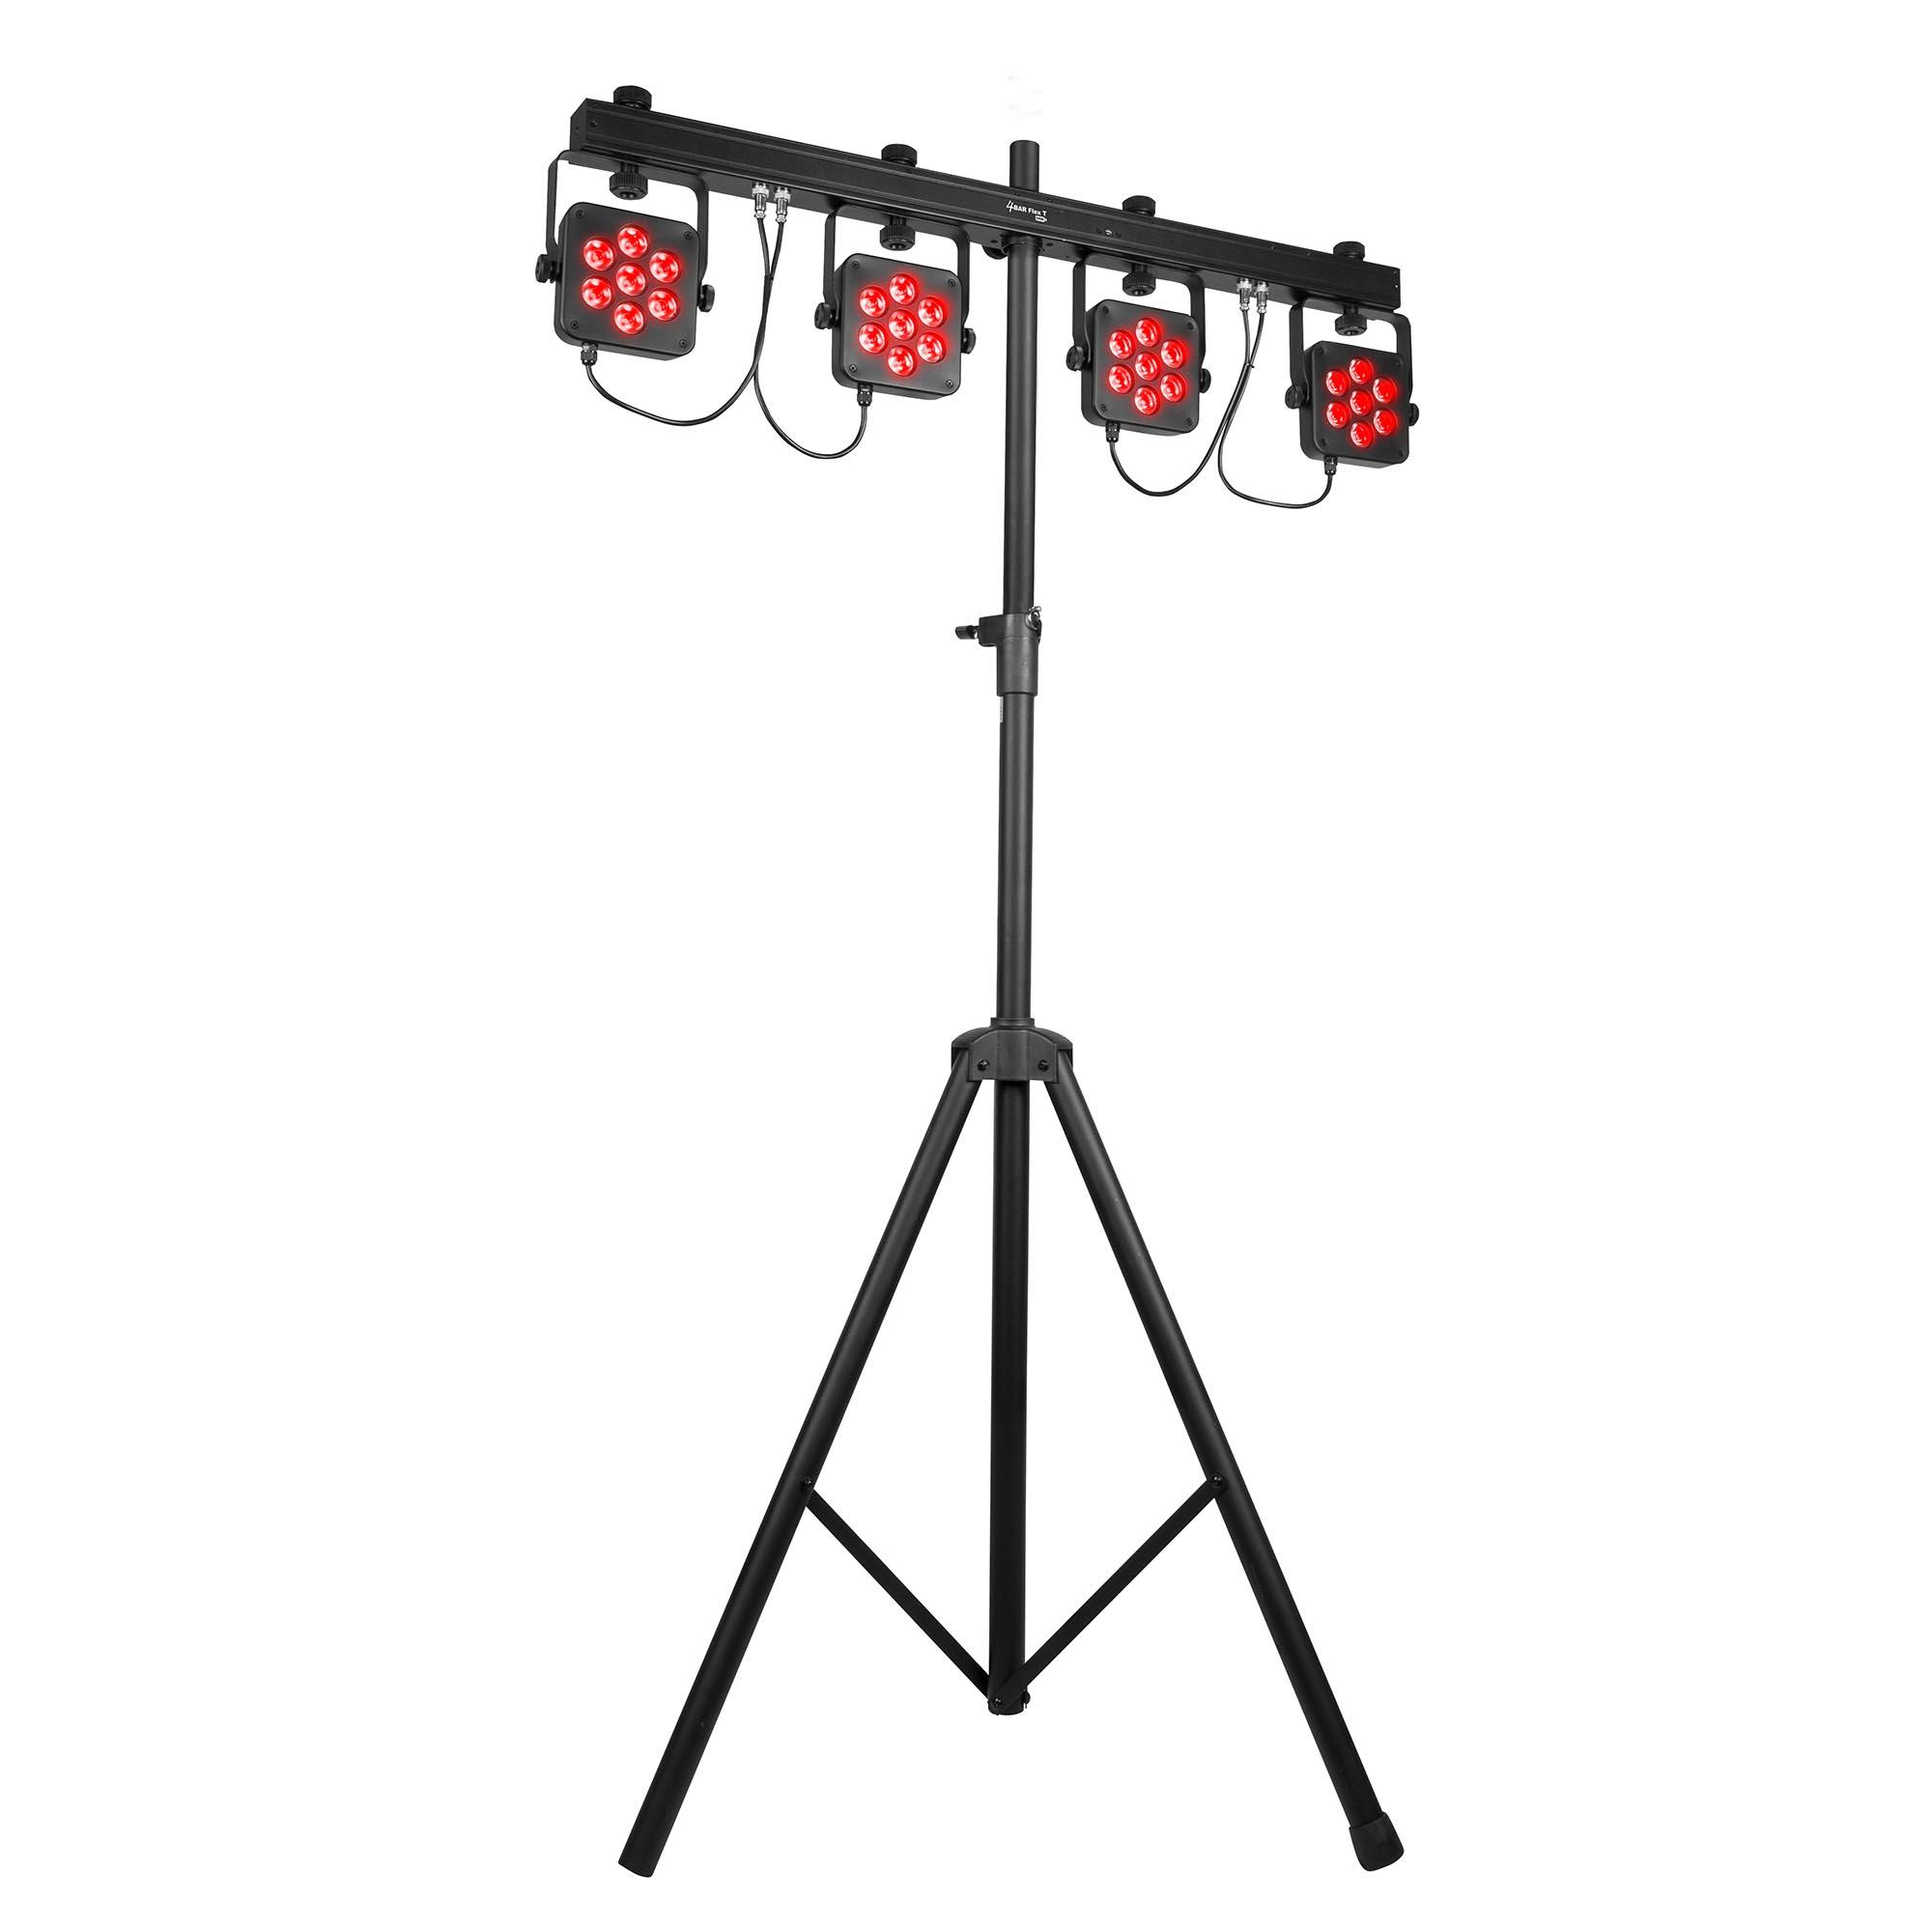 chauvet dj 4bar flex t usb led rgb dmx light effect system w   footswitch  u0026 case 714573528877